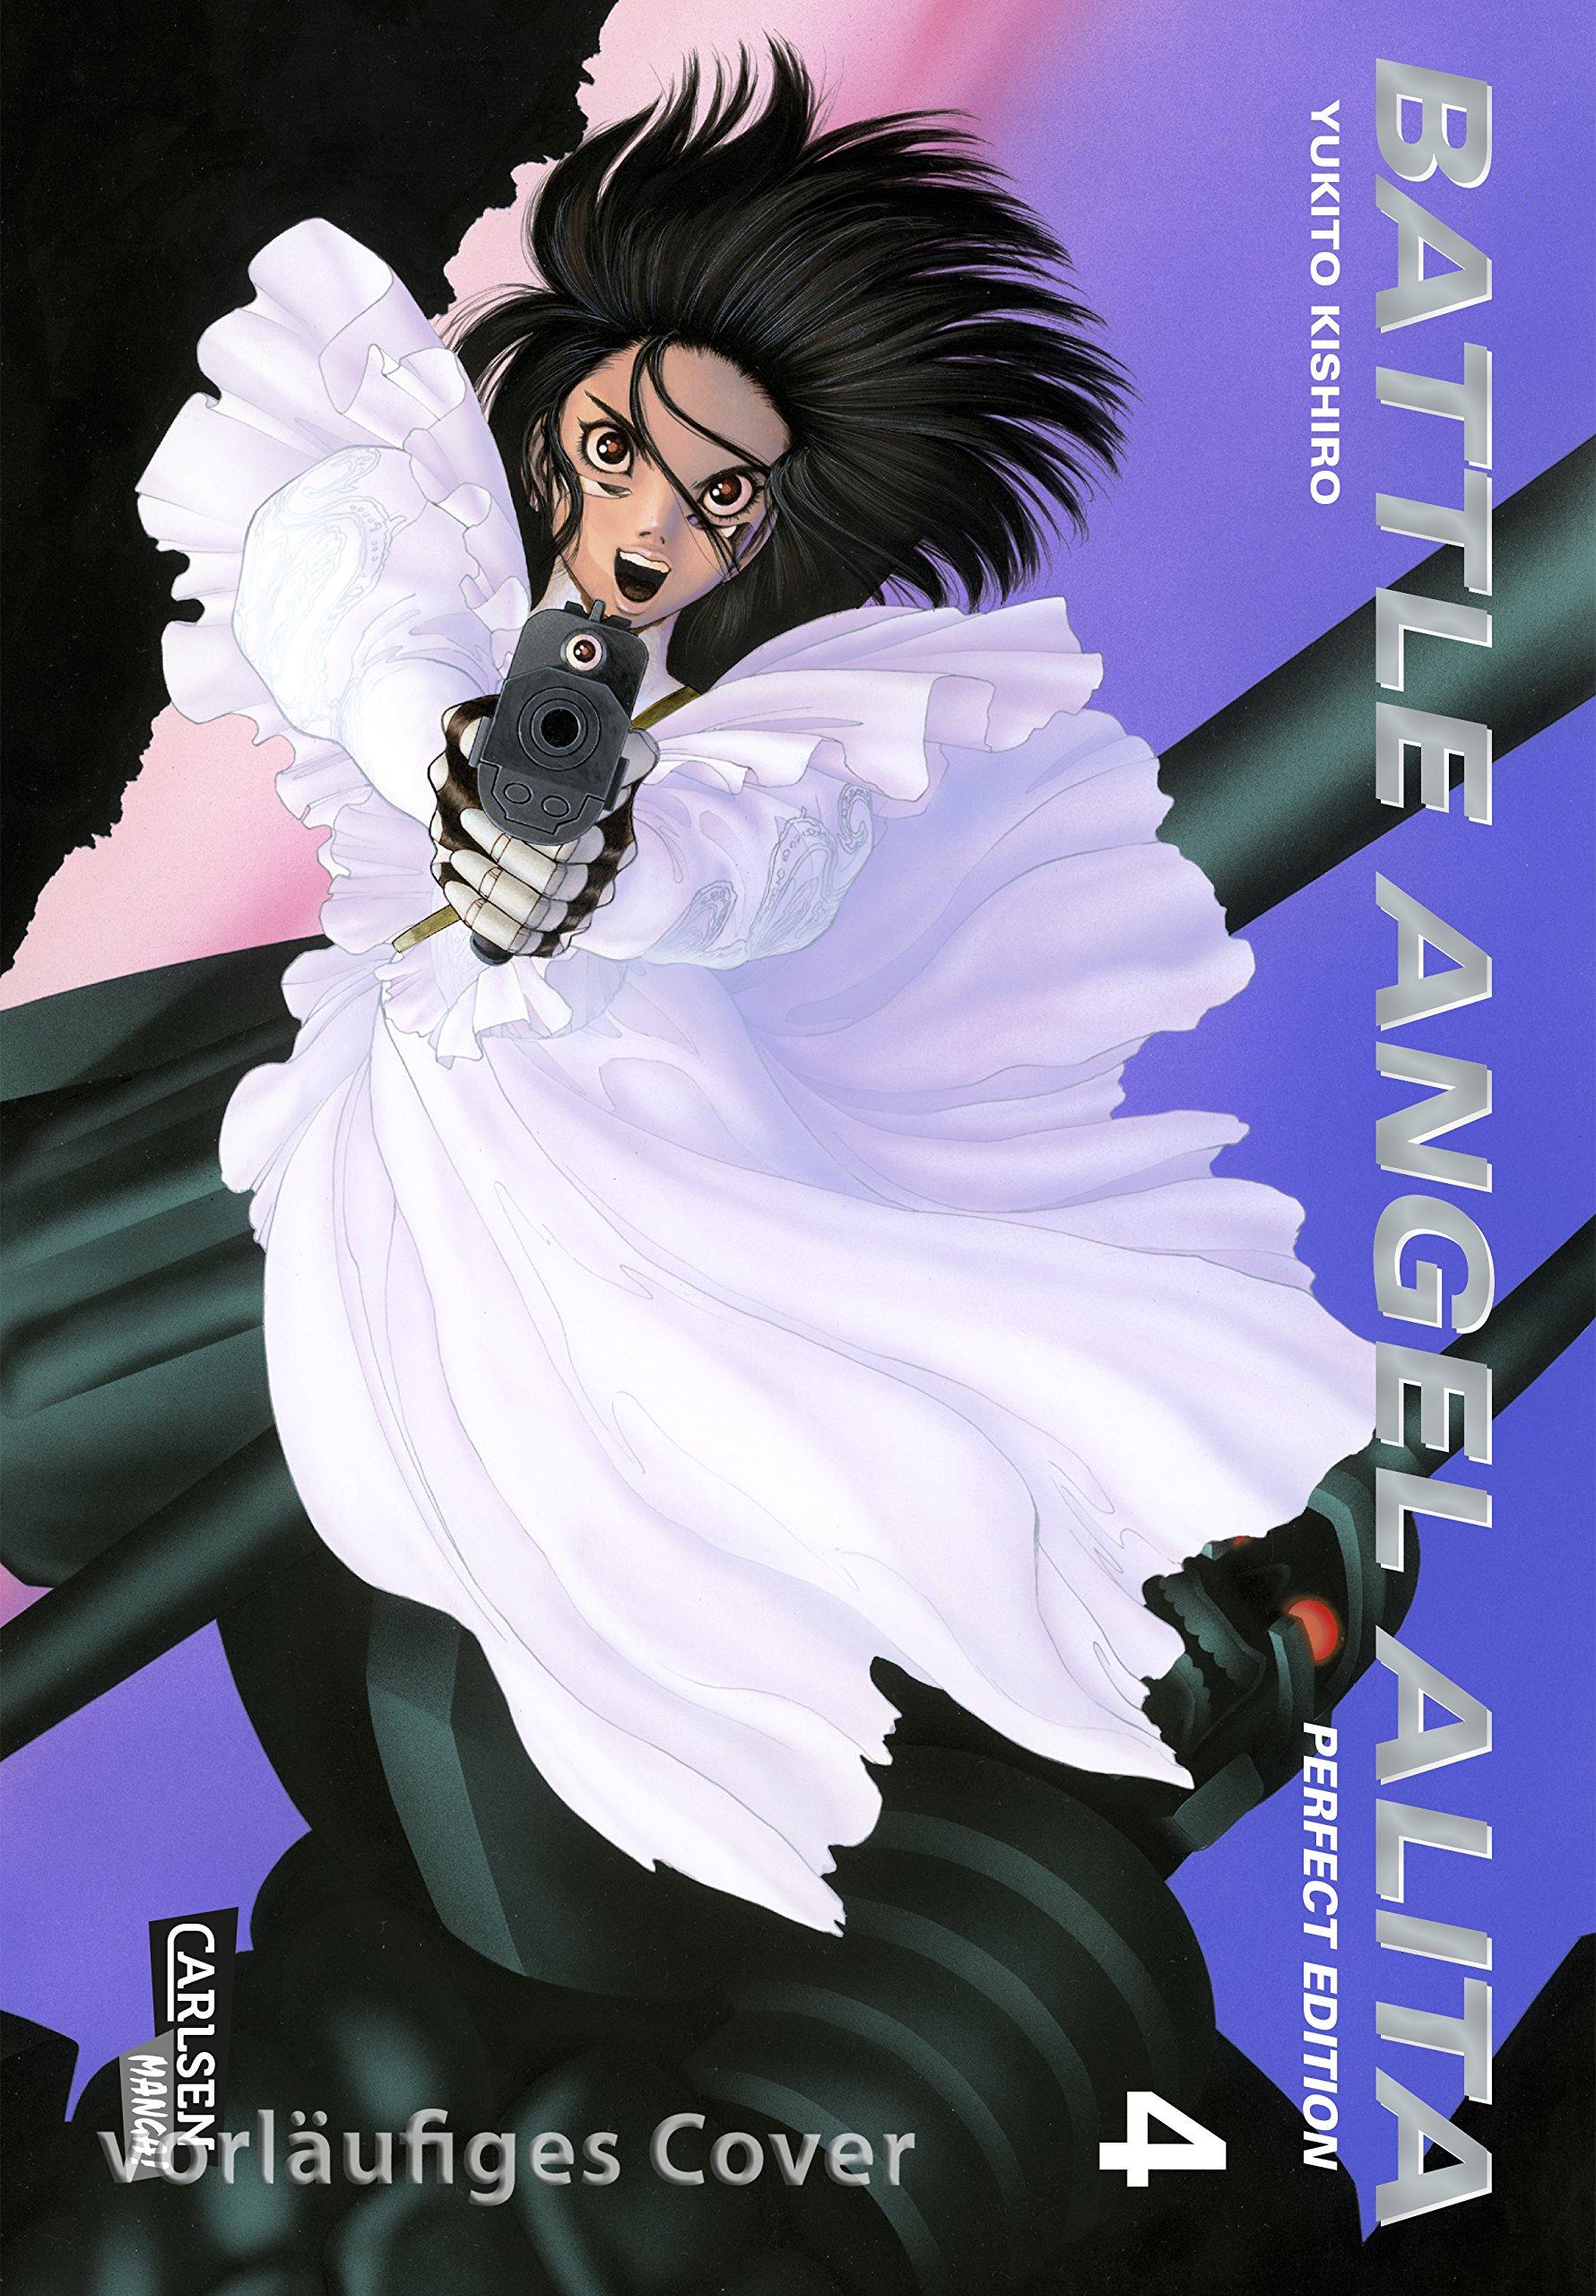 Battle Angel Alita - Perfect Edition 4 Taschenbuch – 31. Juli 2018 Yukito Kishiro Carlsen 3551721386 Manga / Für Männer - Seinen